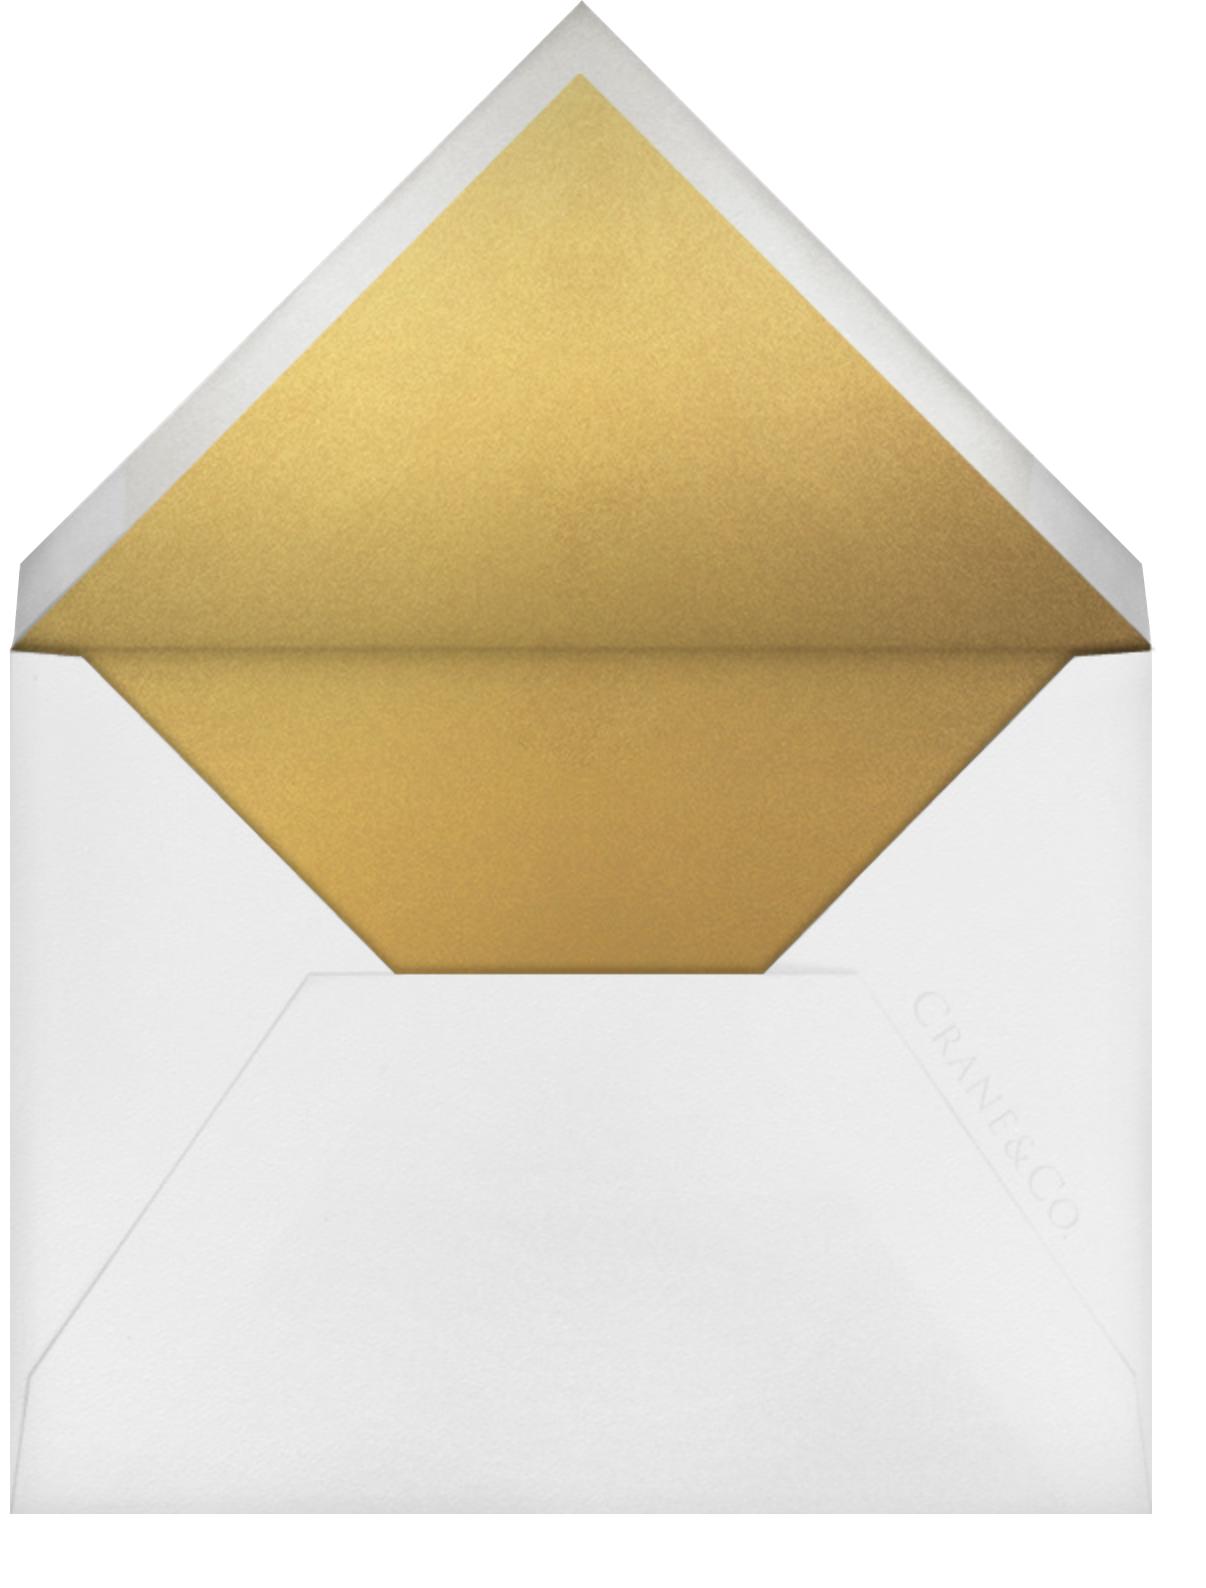 Splatter Cloth I (Invitation) - Gold - Paperless Post - Bar and bat mitzvah - envelope back